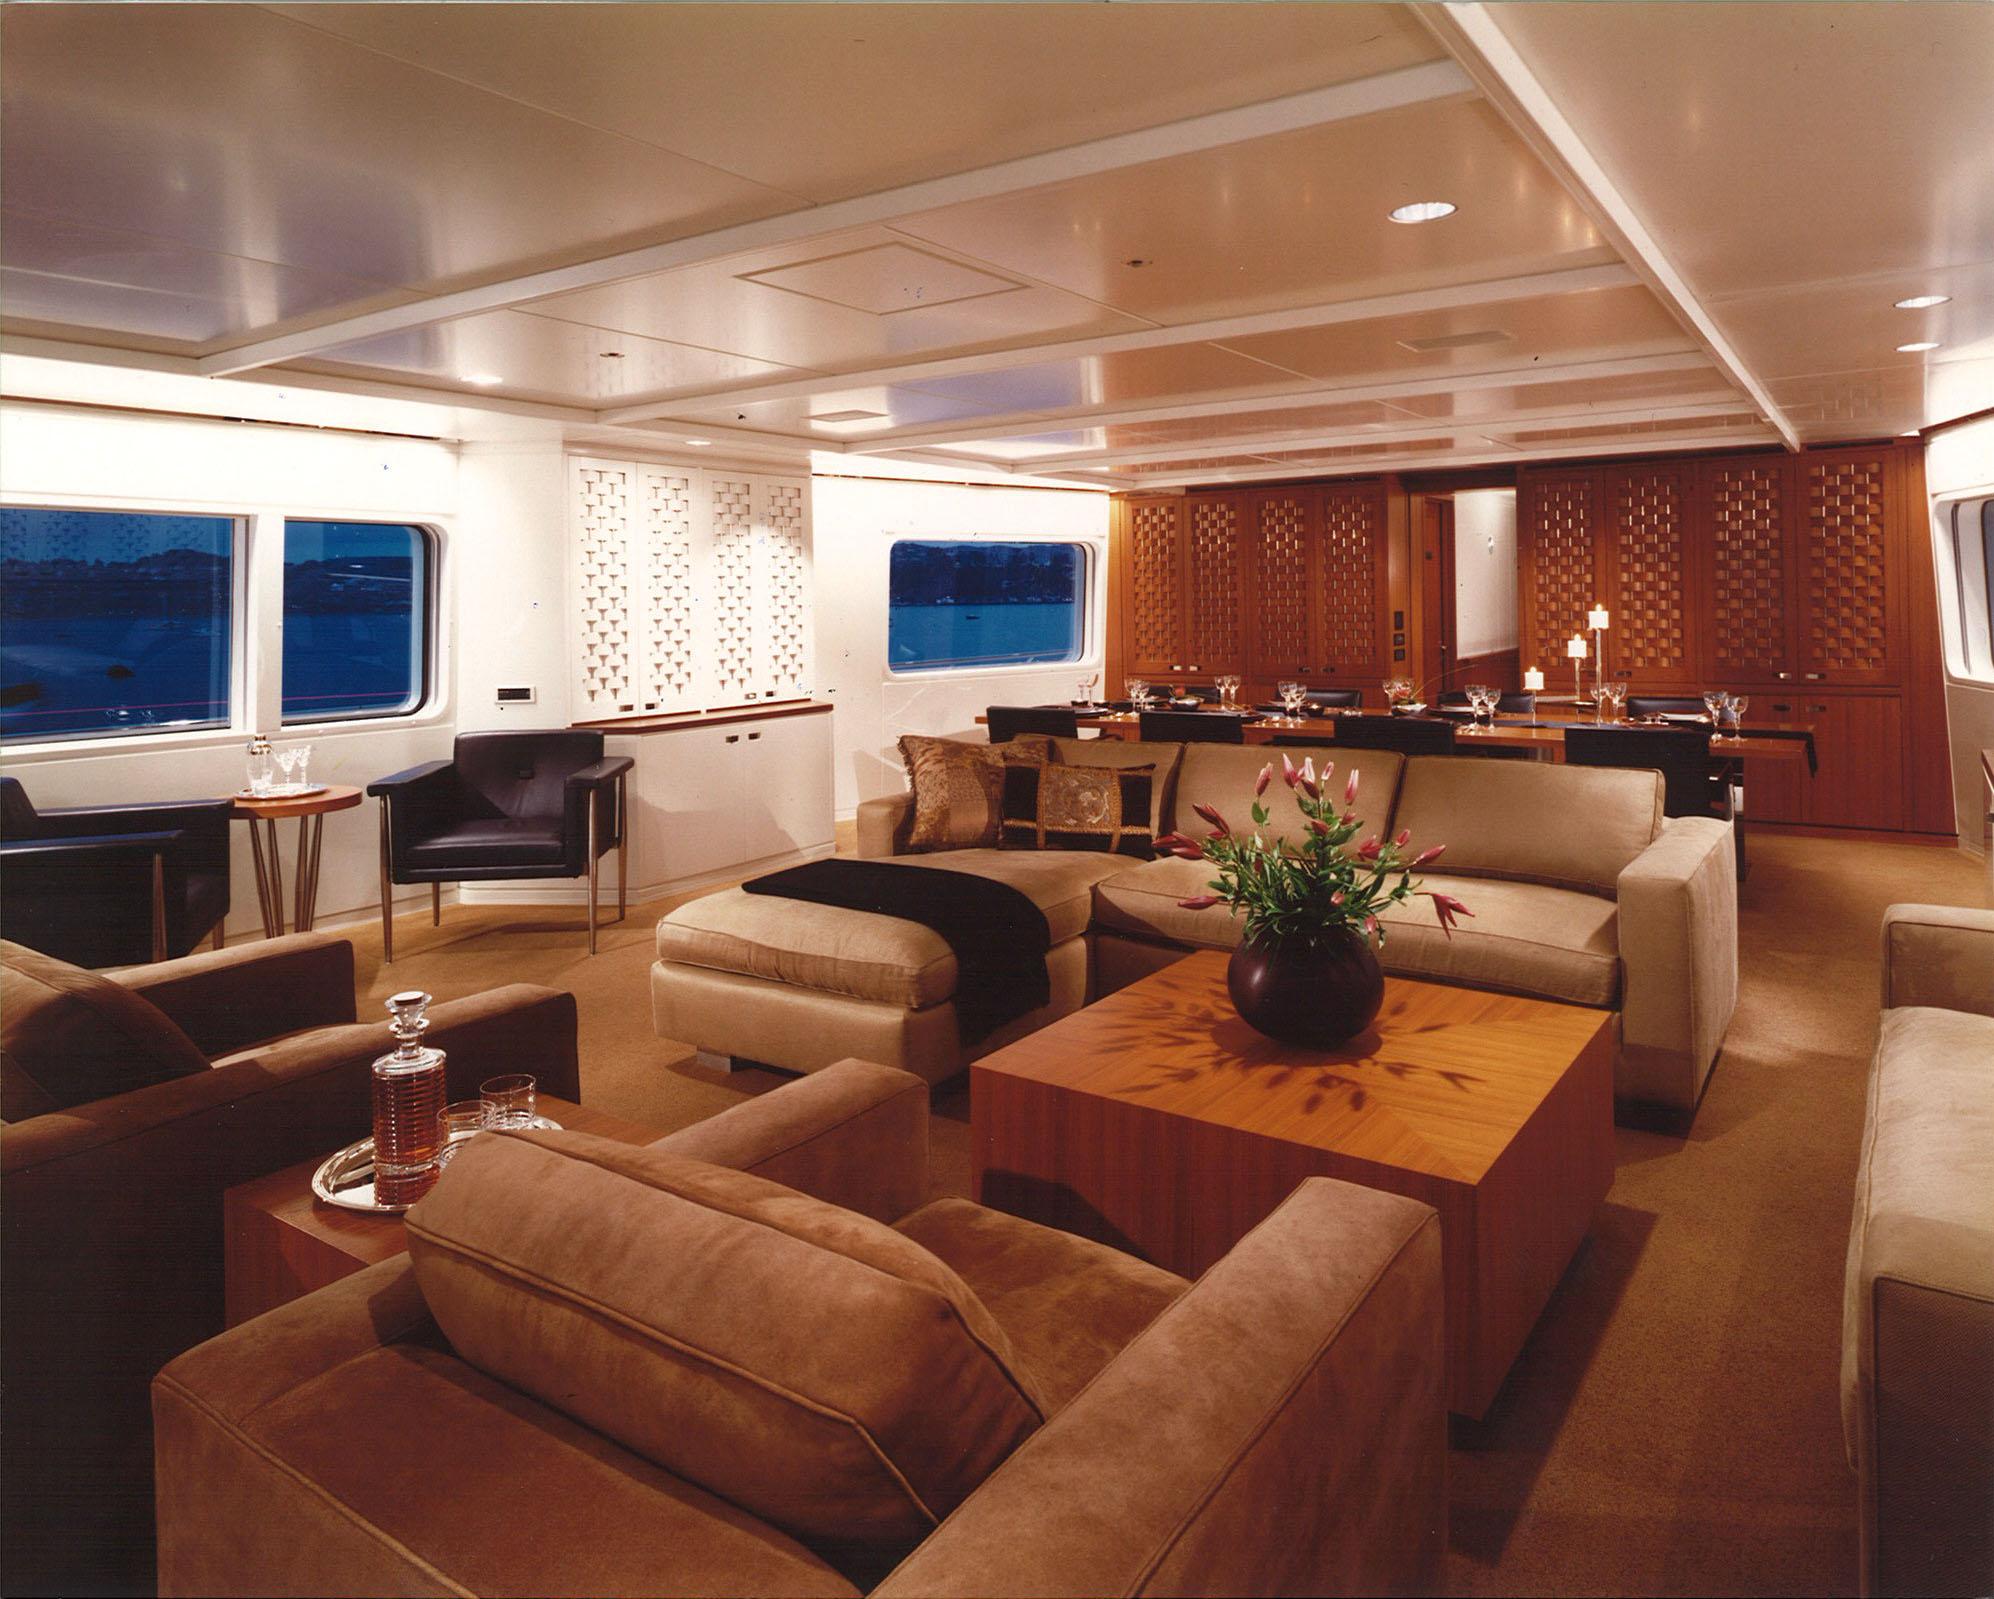 Motor Yacht 2 - Ronin - Living Room.jpg